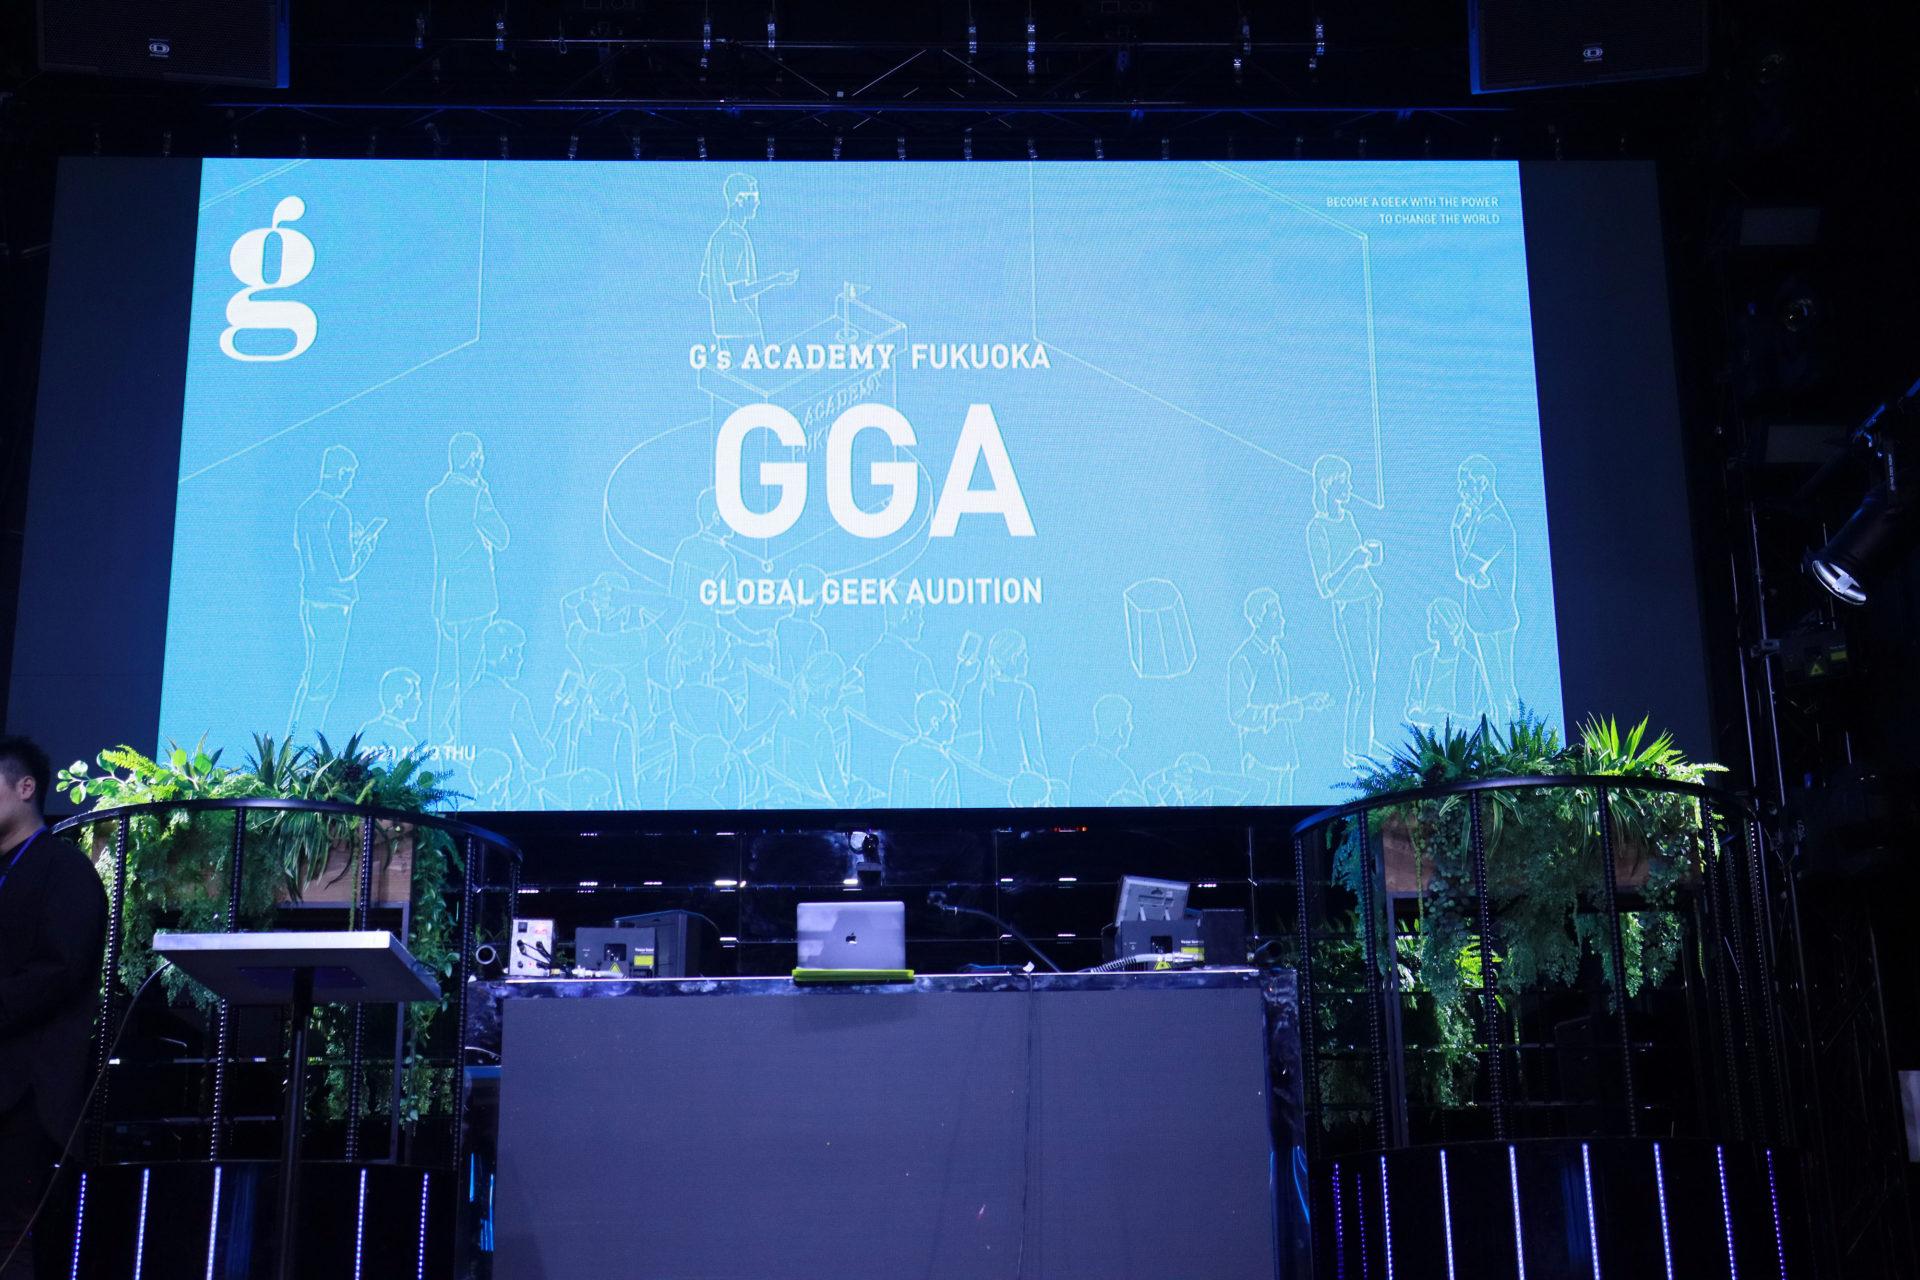 GGAとは